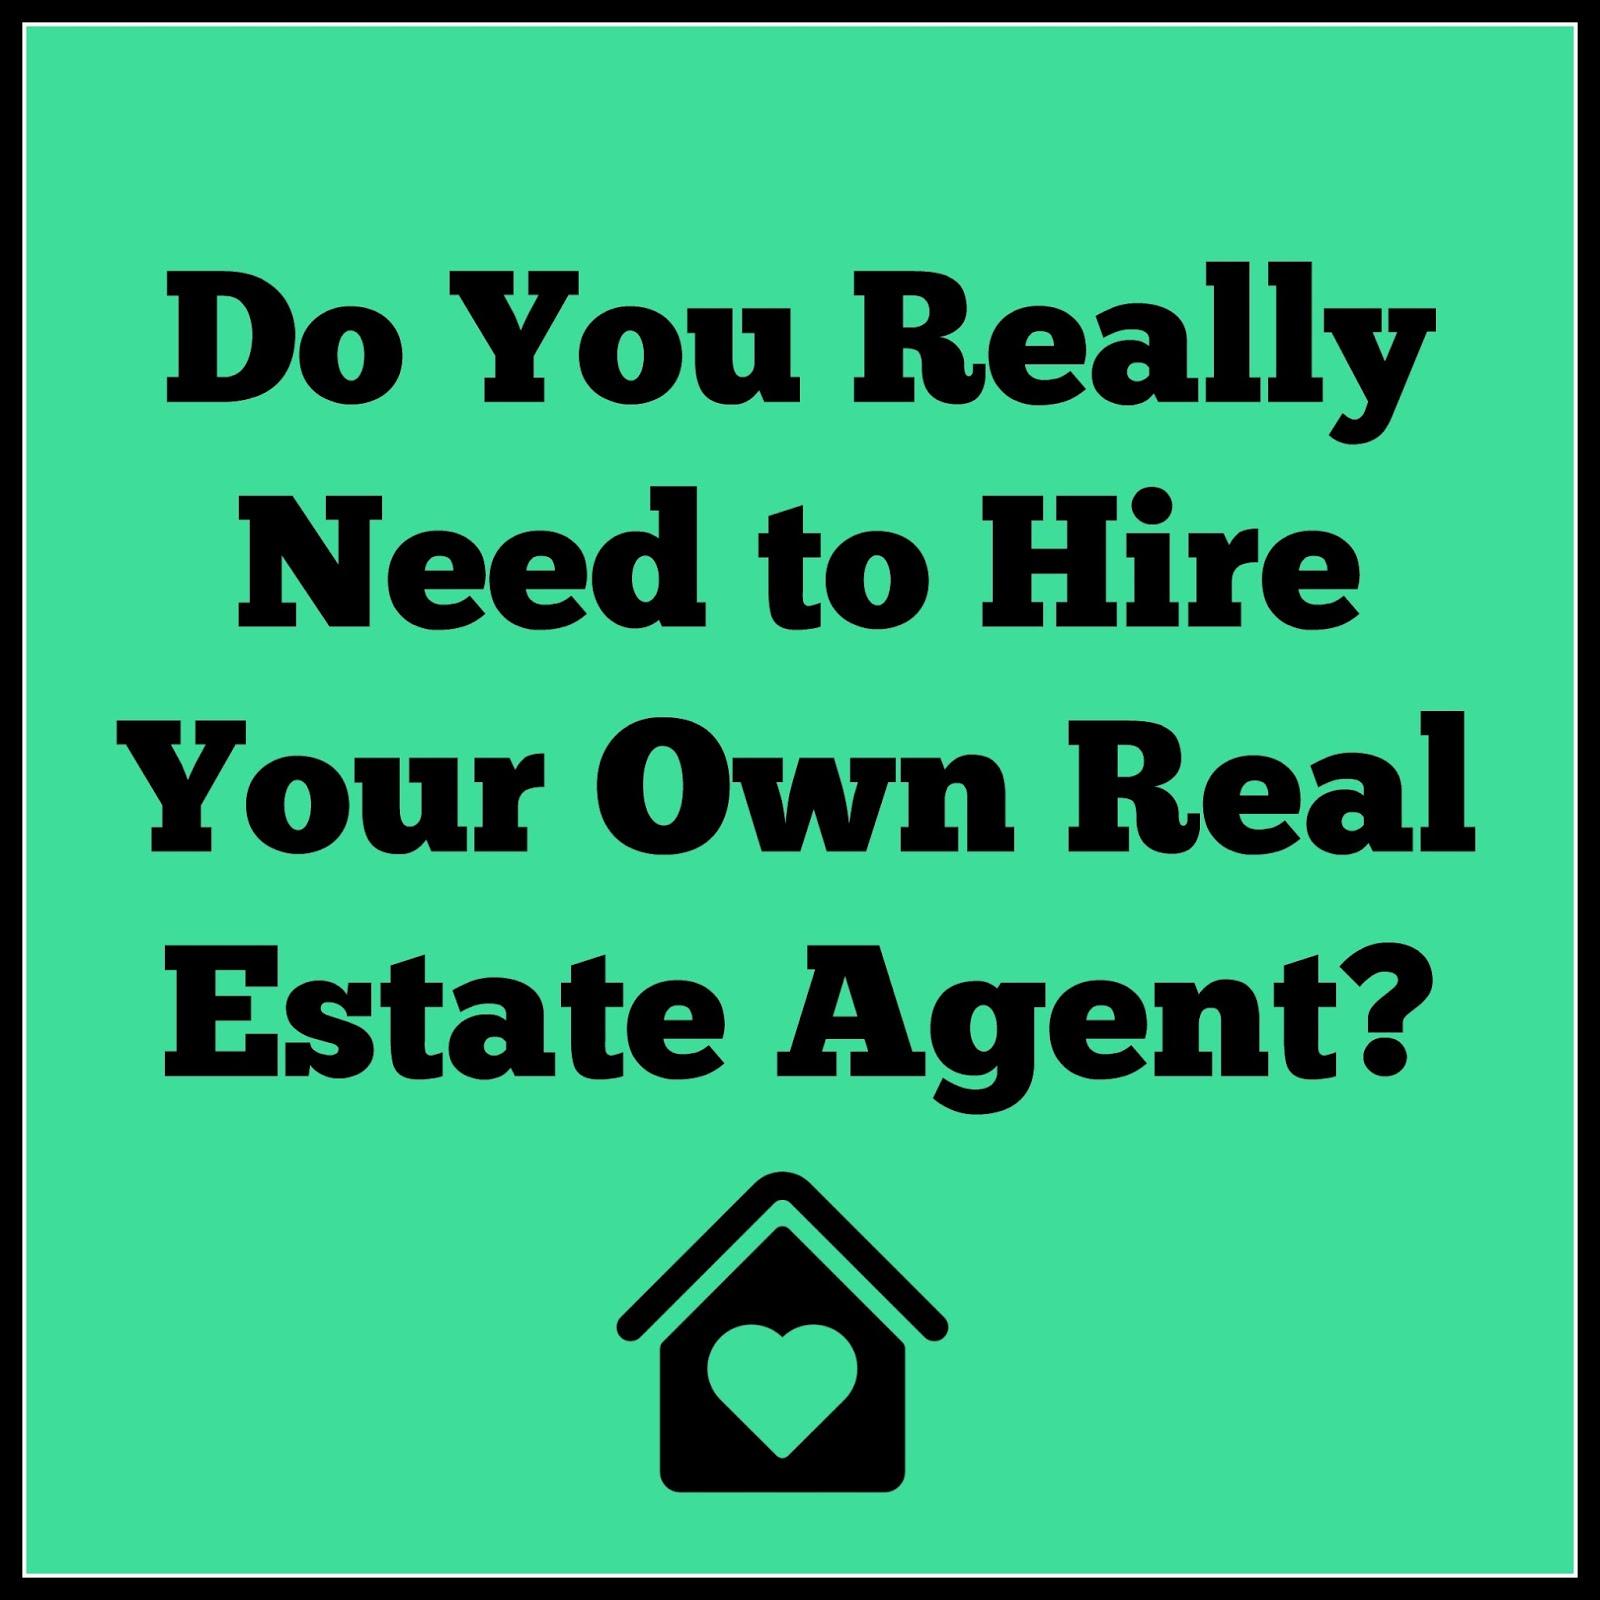 Top 5 Los Angeles Homebuyer Mistakes | Los Angeles real estate agent Glenn Shelhamer | Los Angeles house for sale